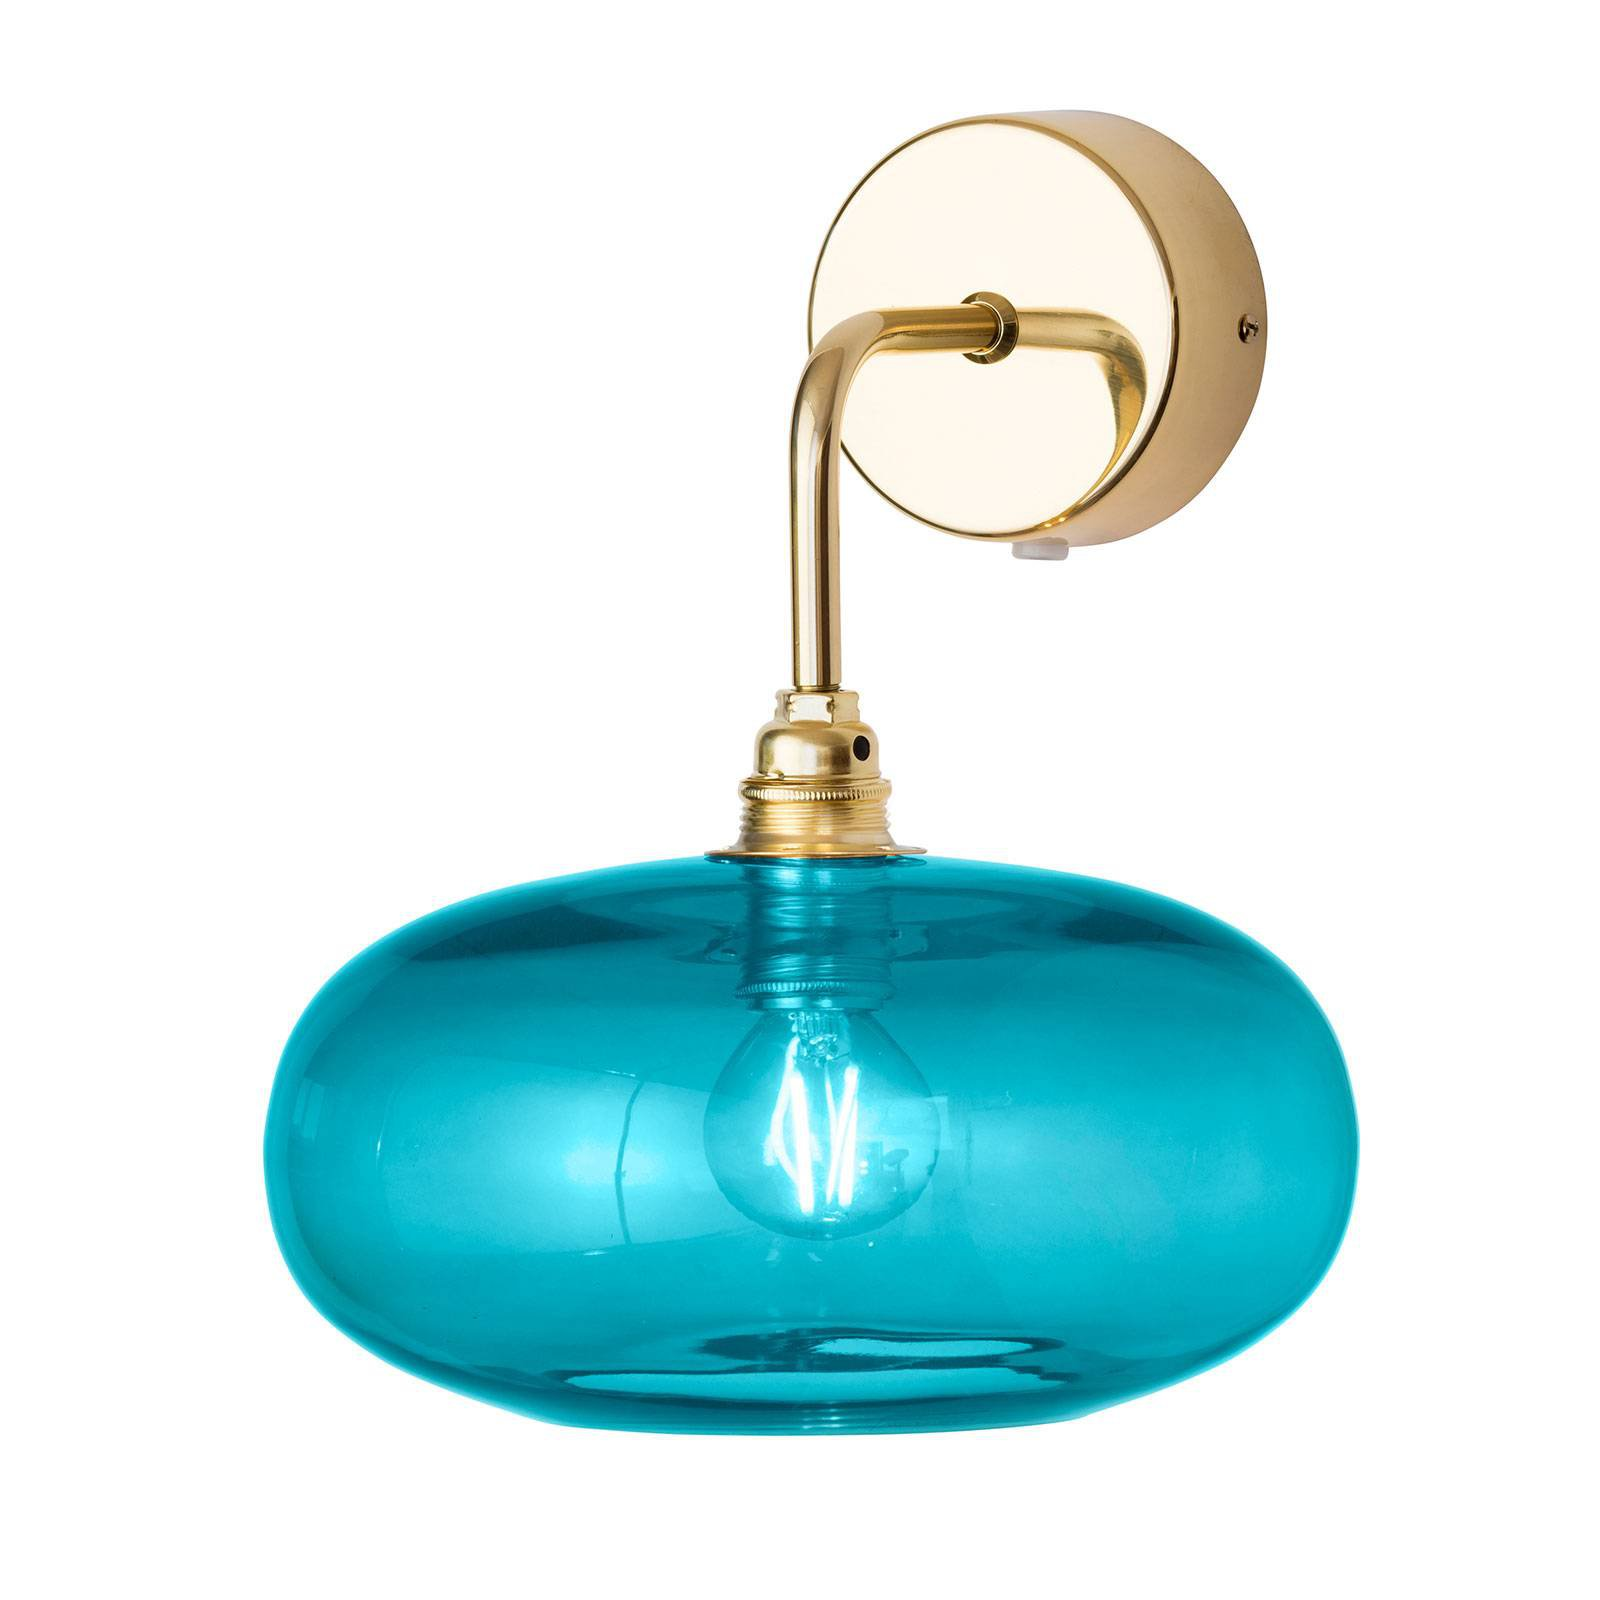 EBB & FLOW Horizon armvegglampe, gull/blå, Ø 21 cm